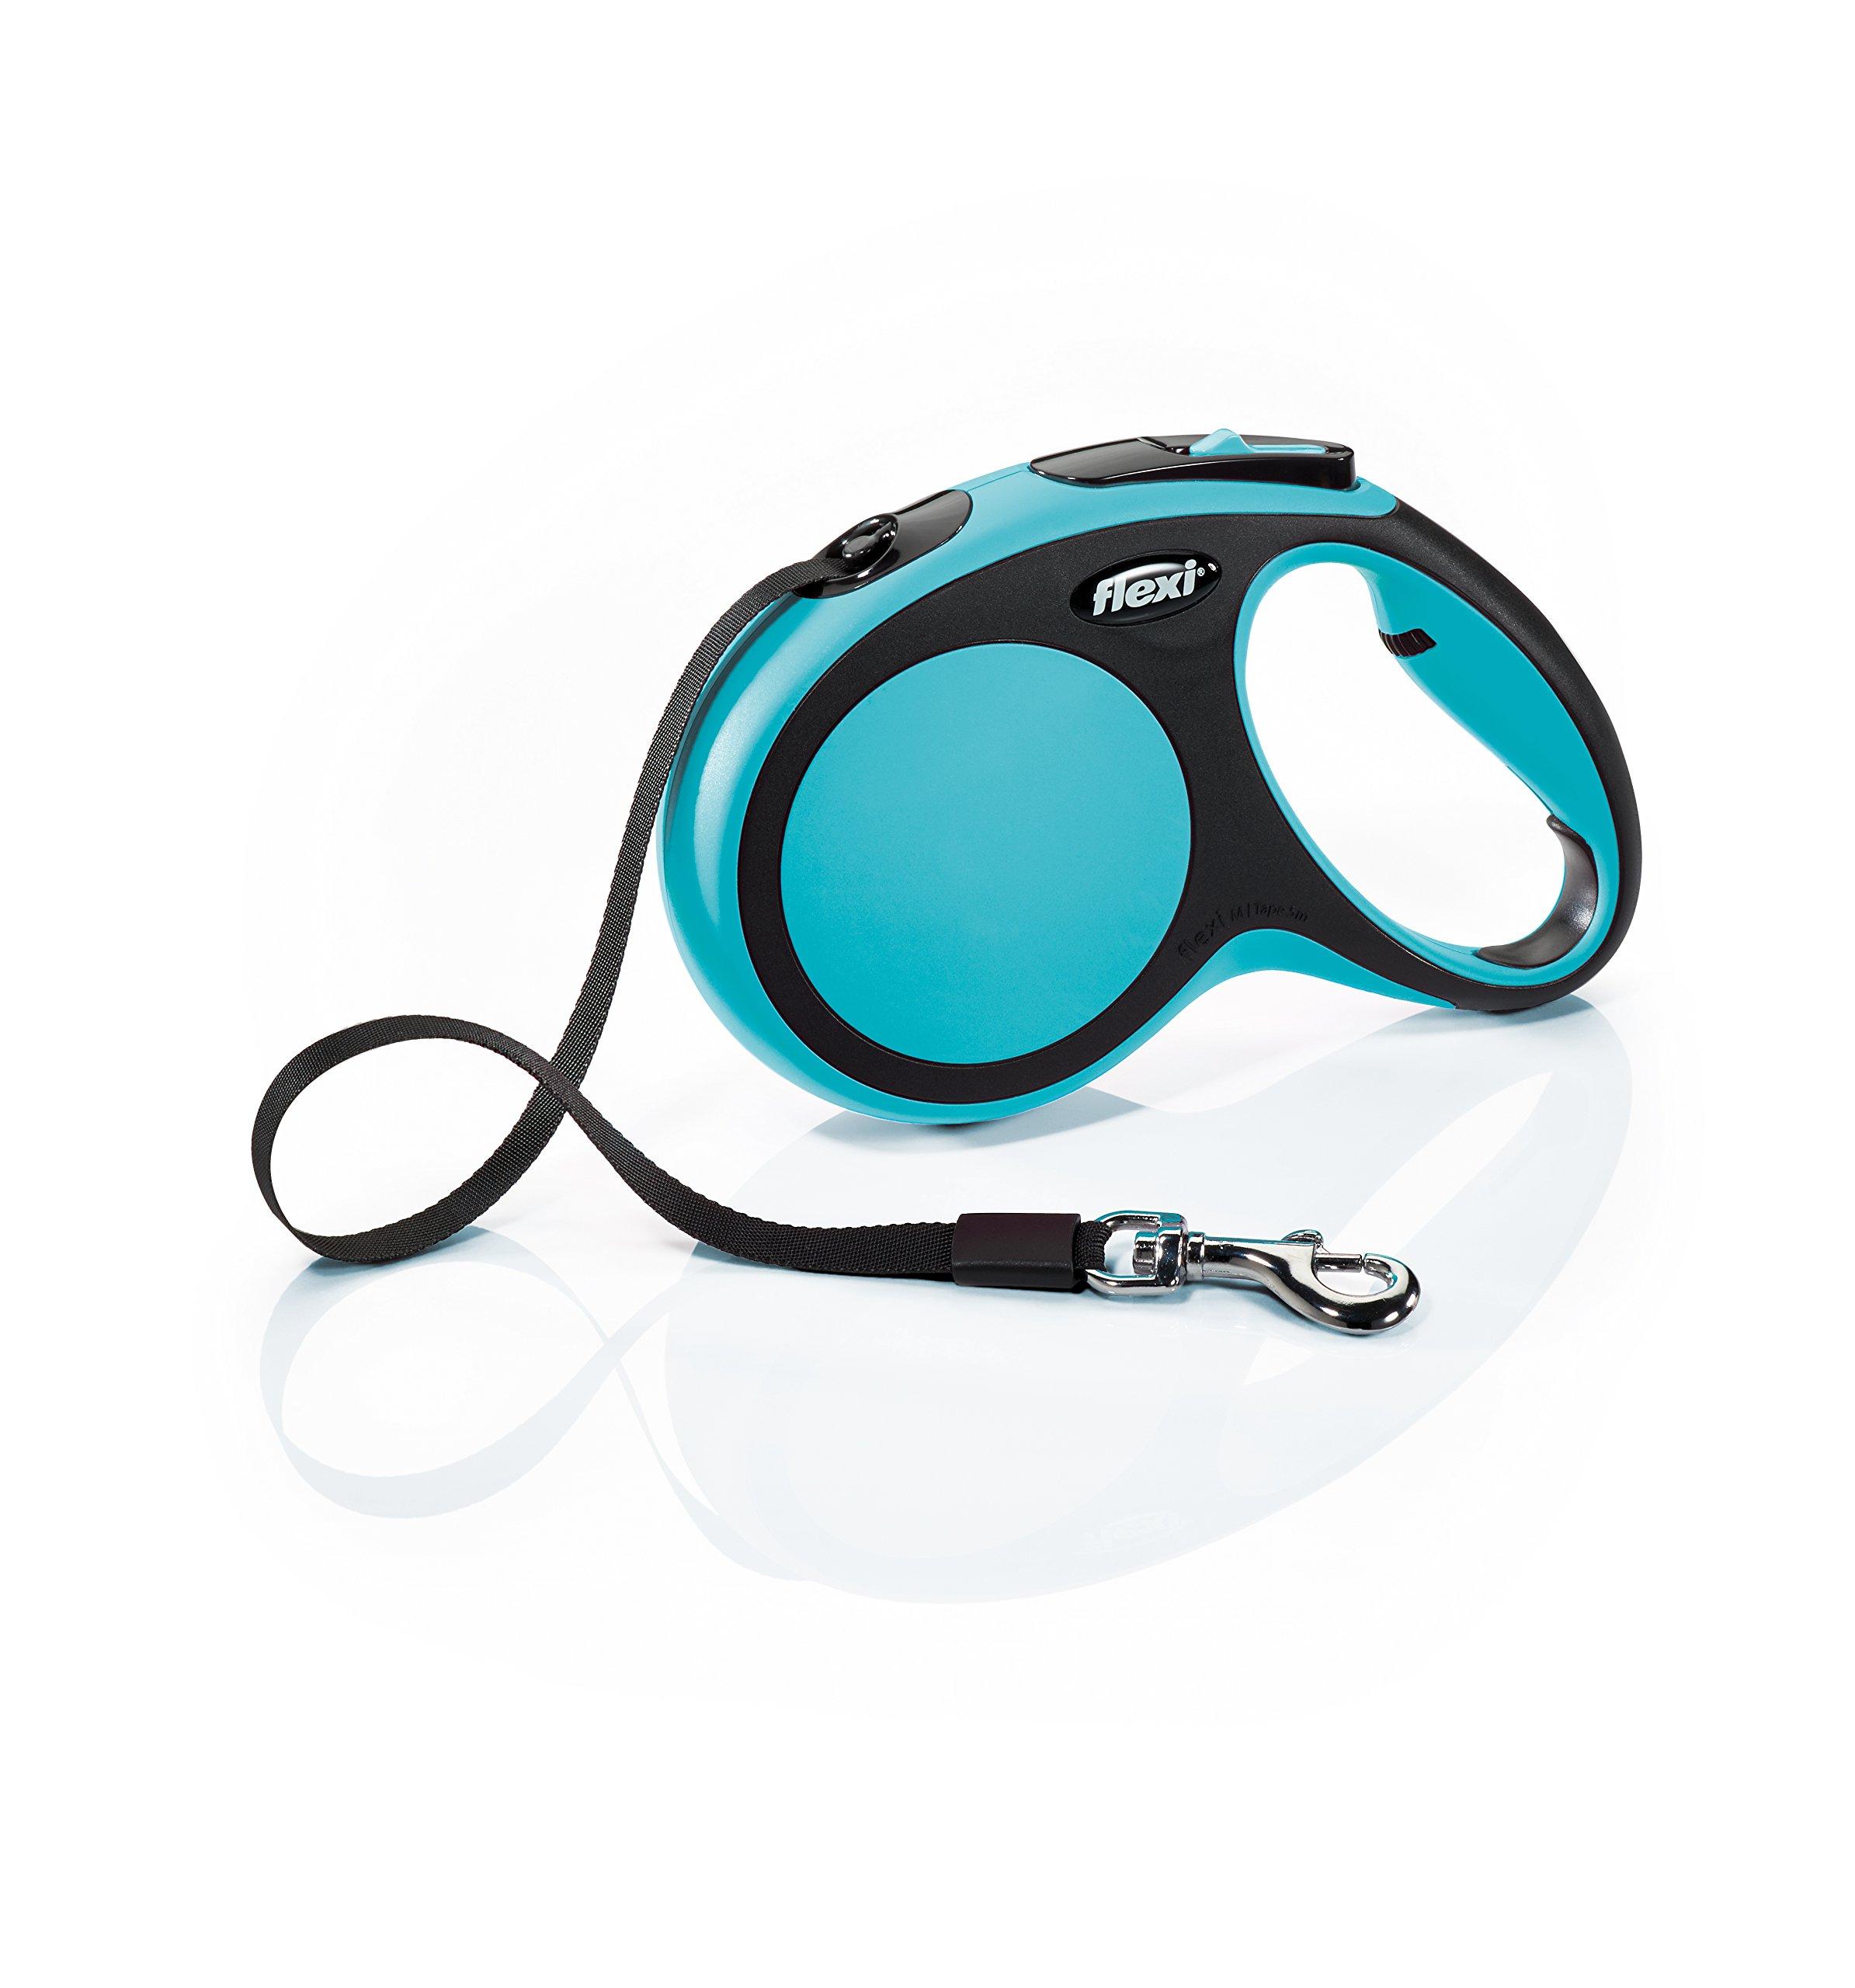 Flexi New Comfort Retractable Dog Leash (Tape), 16 ft, Medium, Blue